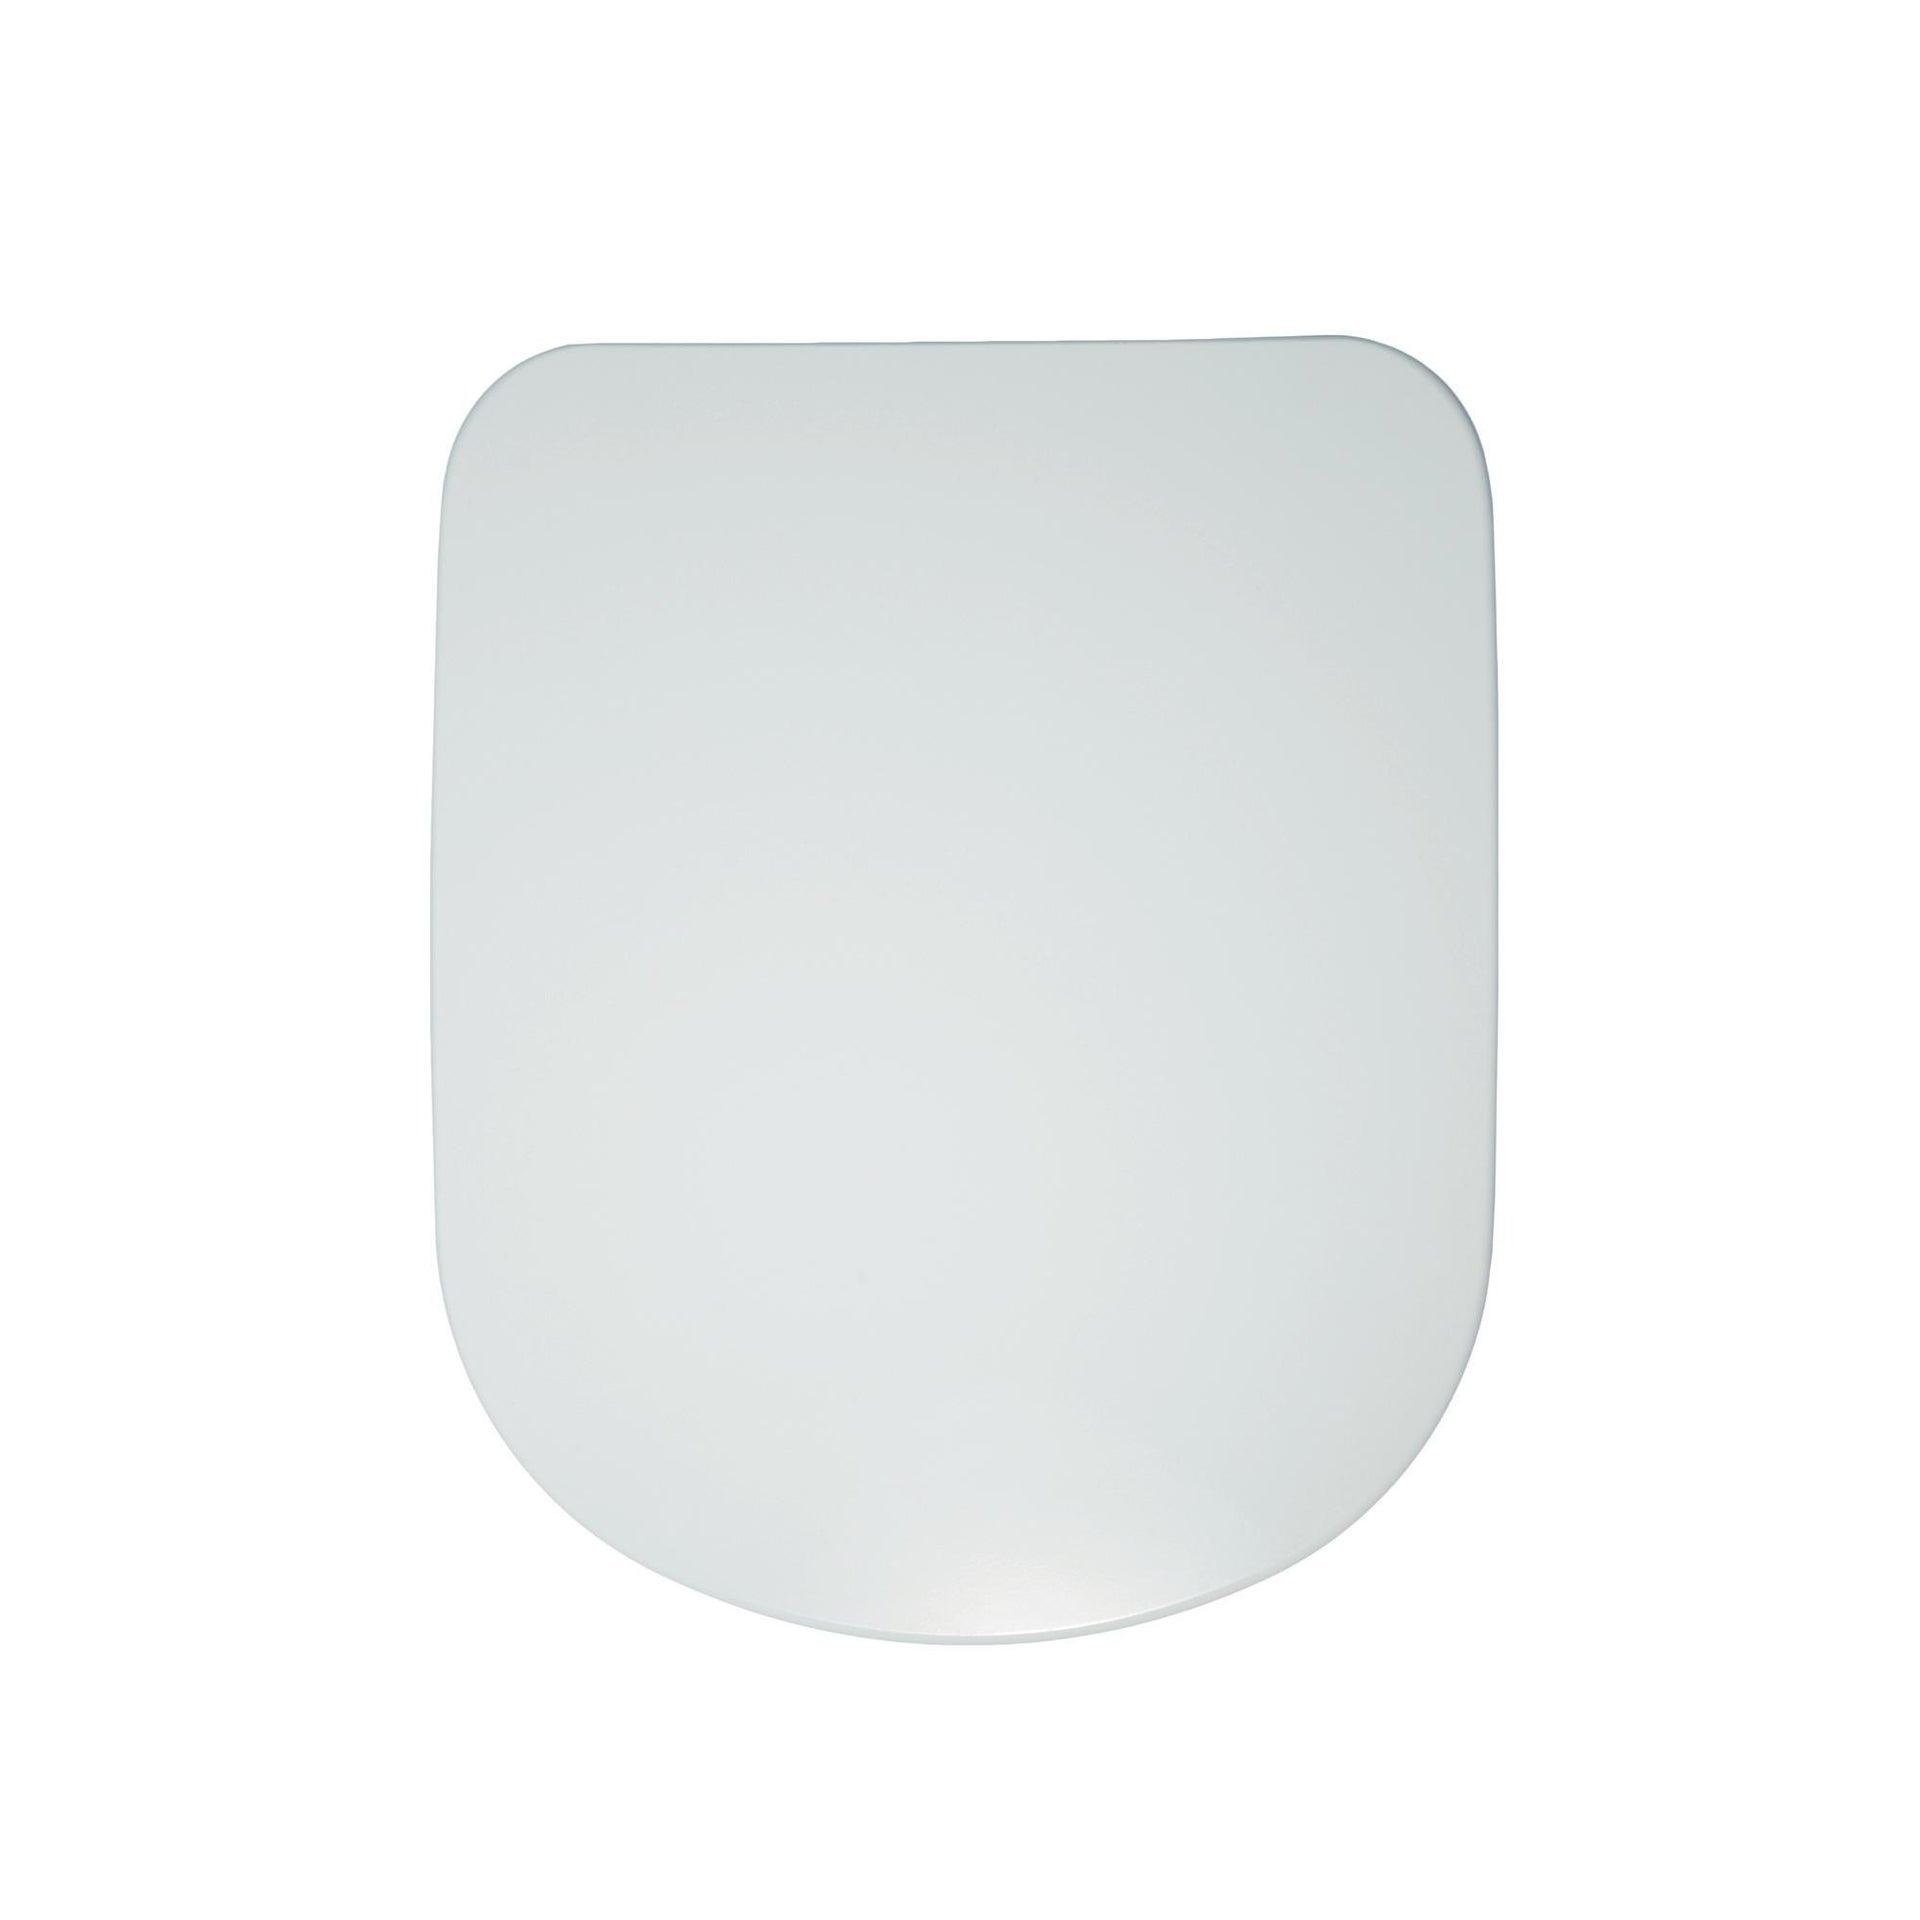 Copriwater ovale Originale per serie sanitari Gemma 2 IDEAL STANDARD termoindurente bianco - 3